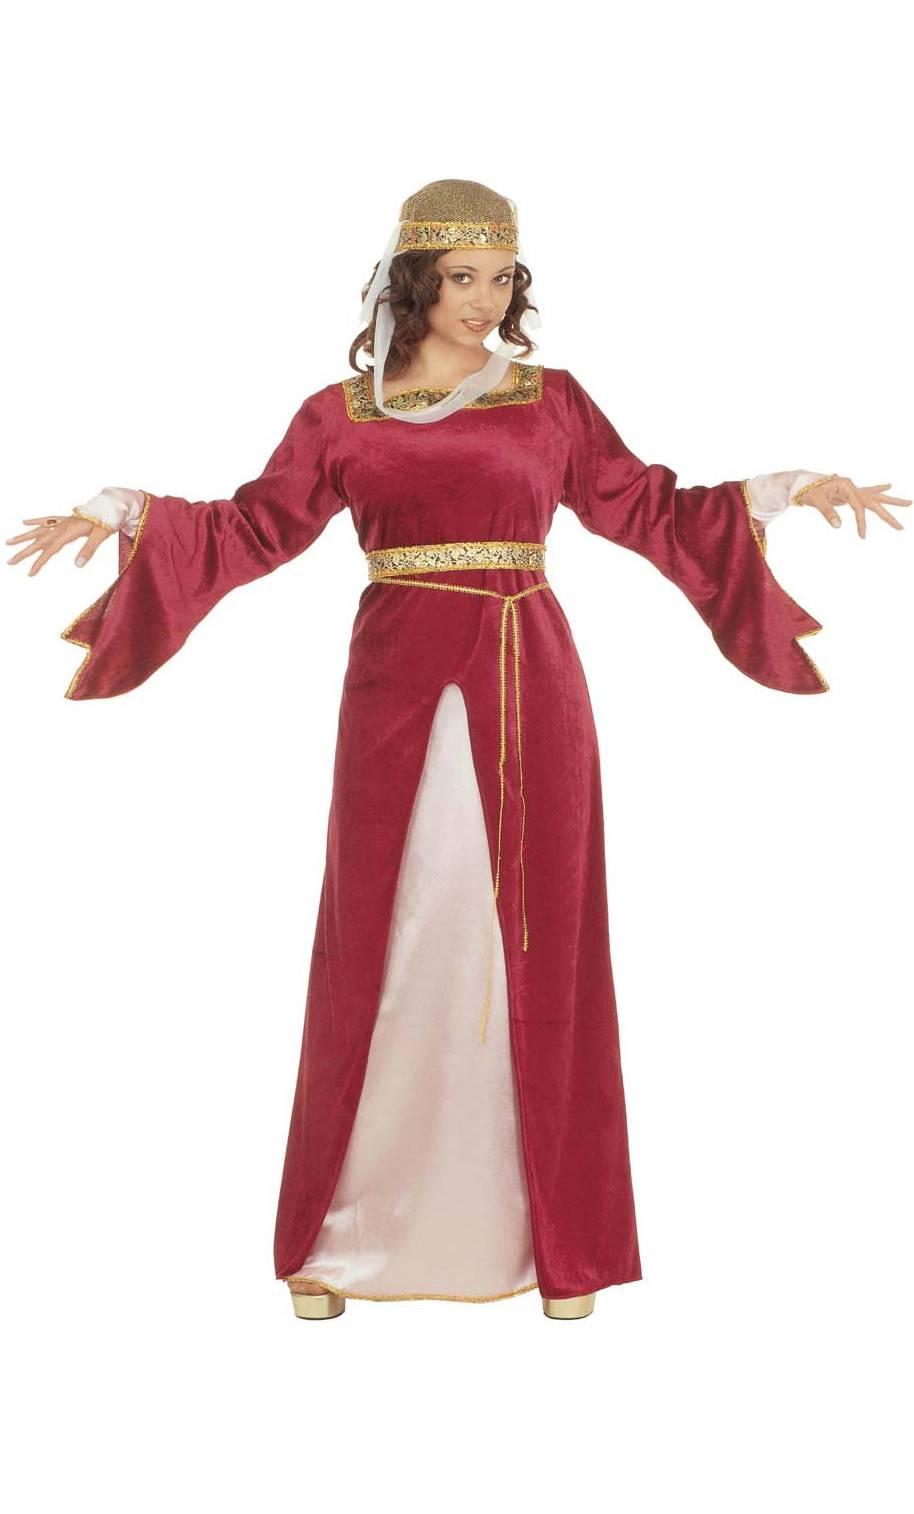 Costume-Méviévale-Mildrède-Grande-Taille-XL-2